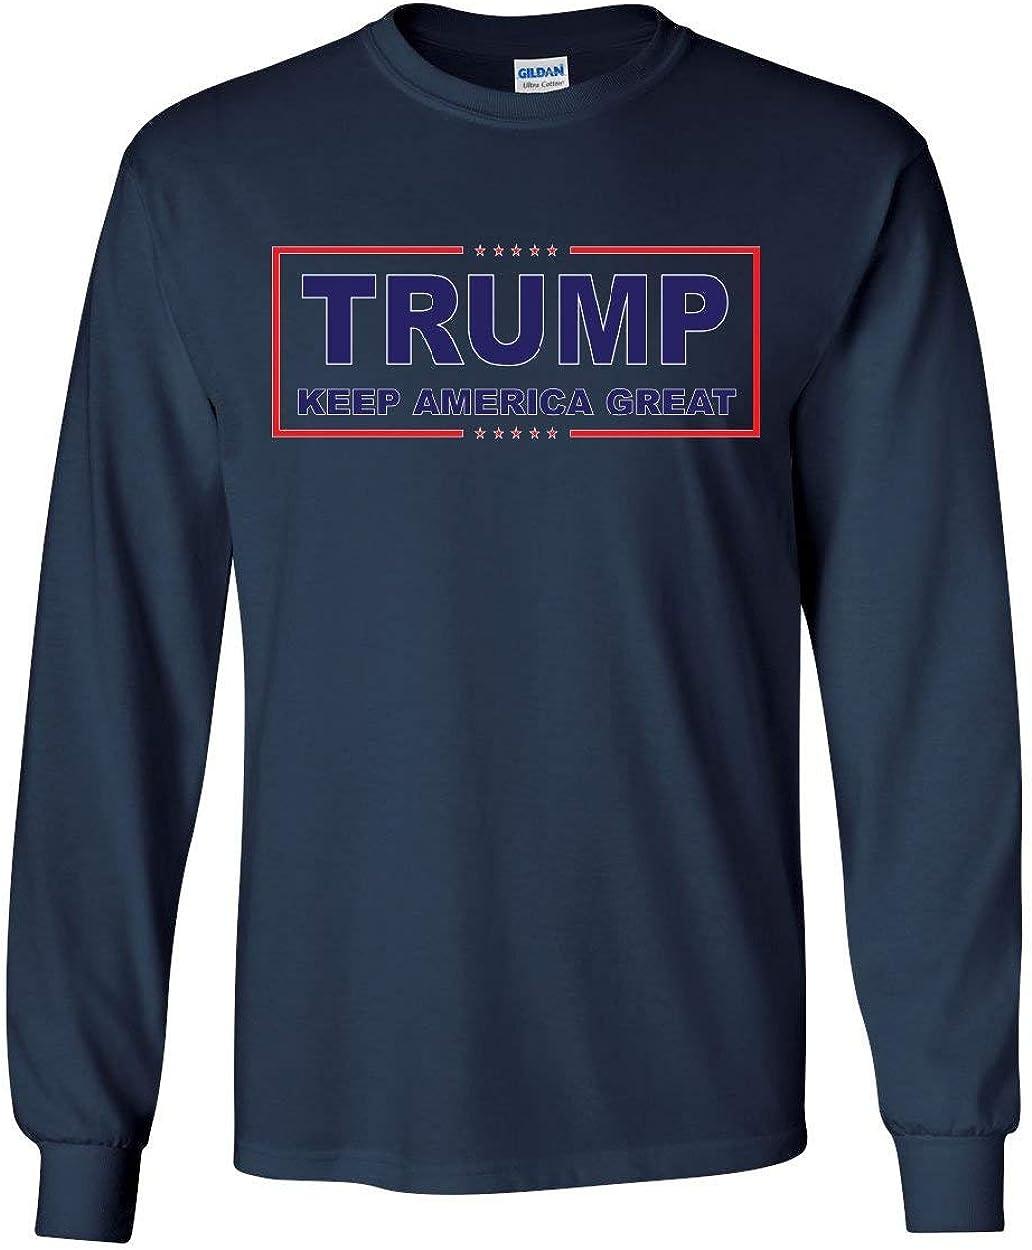 Trump Keep America Great Long Sleeve T-Shirt 2020 Election Republican POTUS Tee